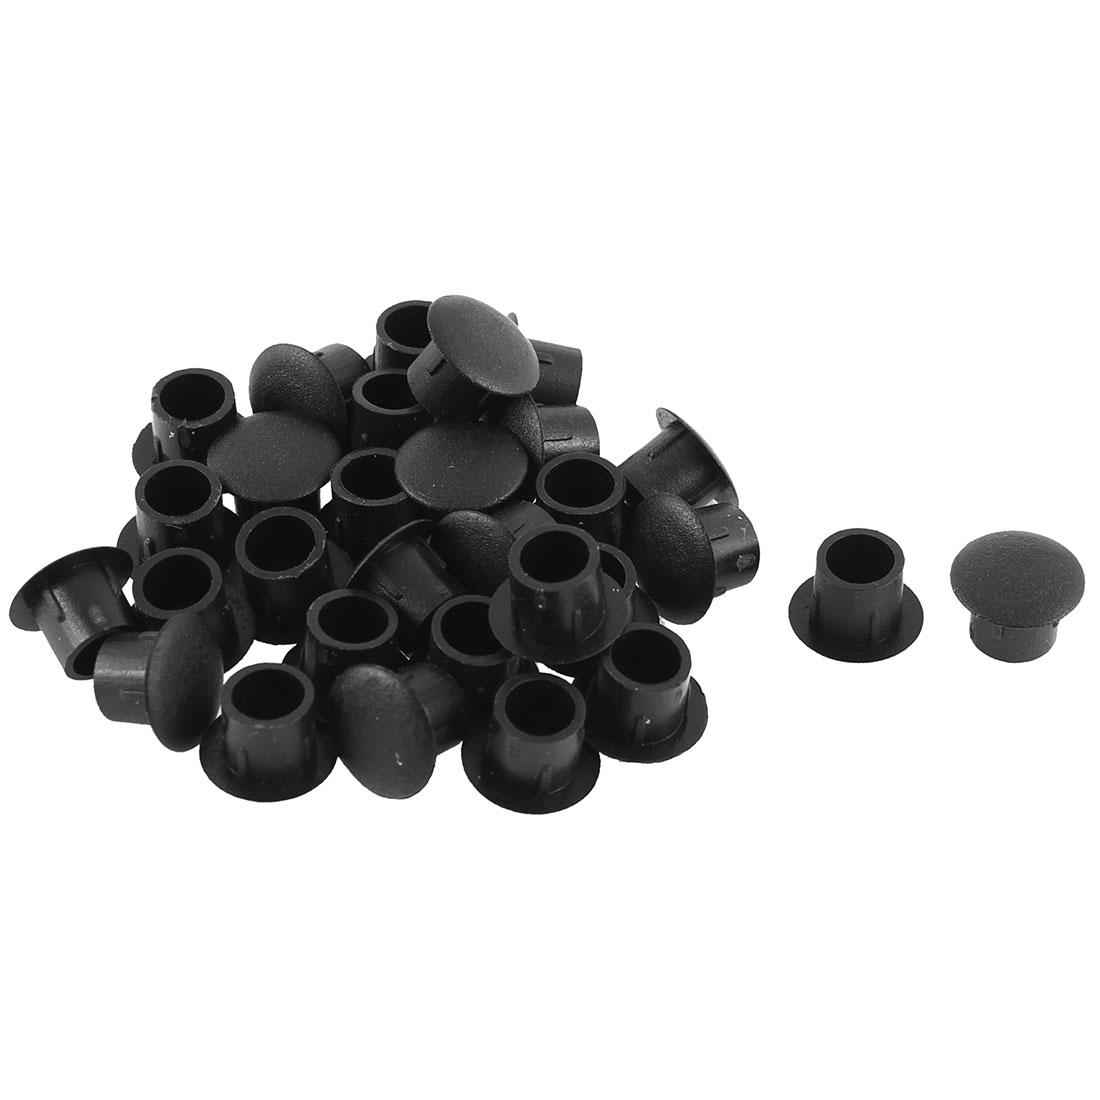 Home Kitchen Plastic Cabinet Decor Hole Cover Tube Insert Black 8mm Dia 30pcs